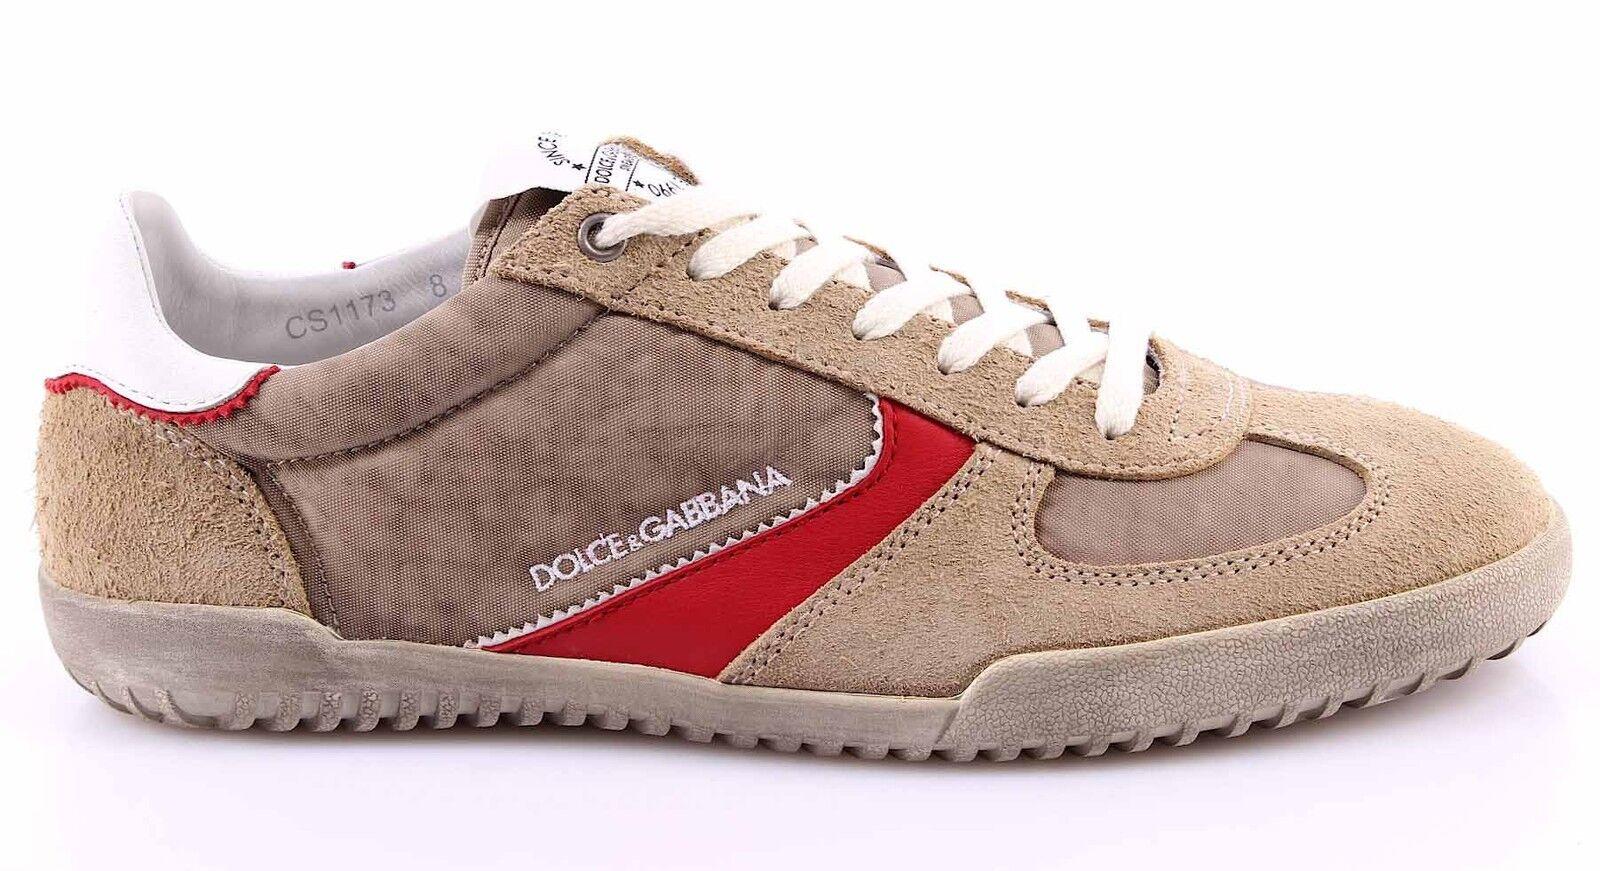 Herren GABBANA Sneakers Schuhe DOLCE & GABBANA Herren Wildleder Canvas Sand Beige 52622c